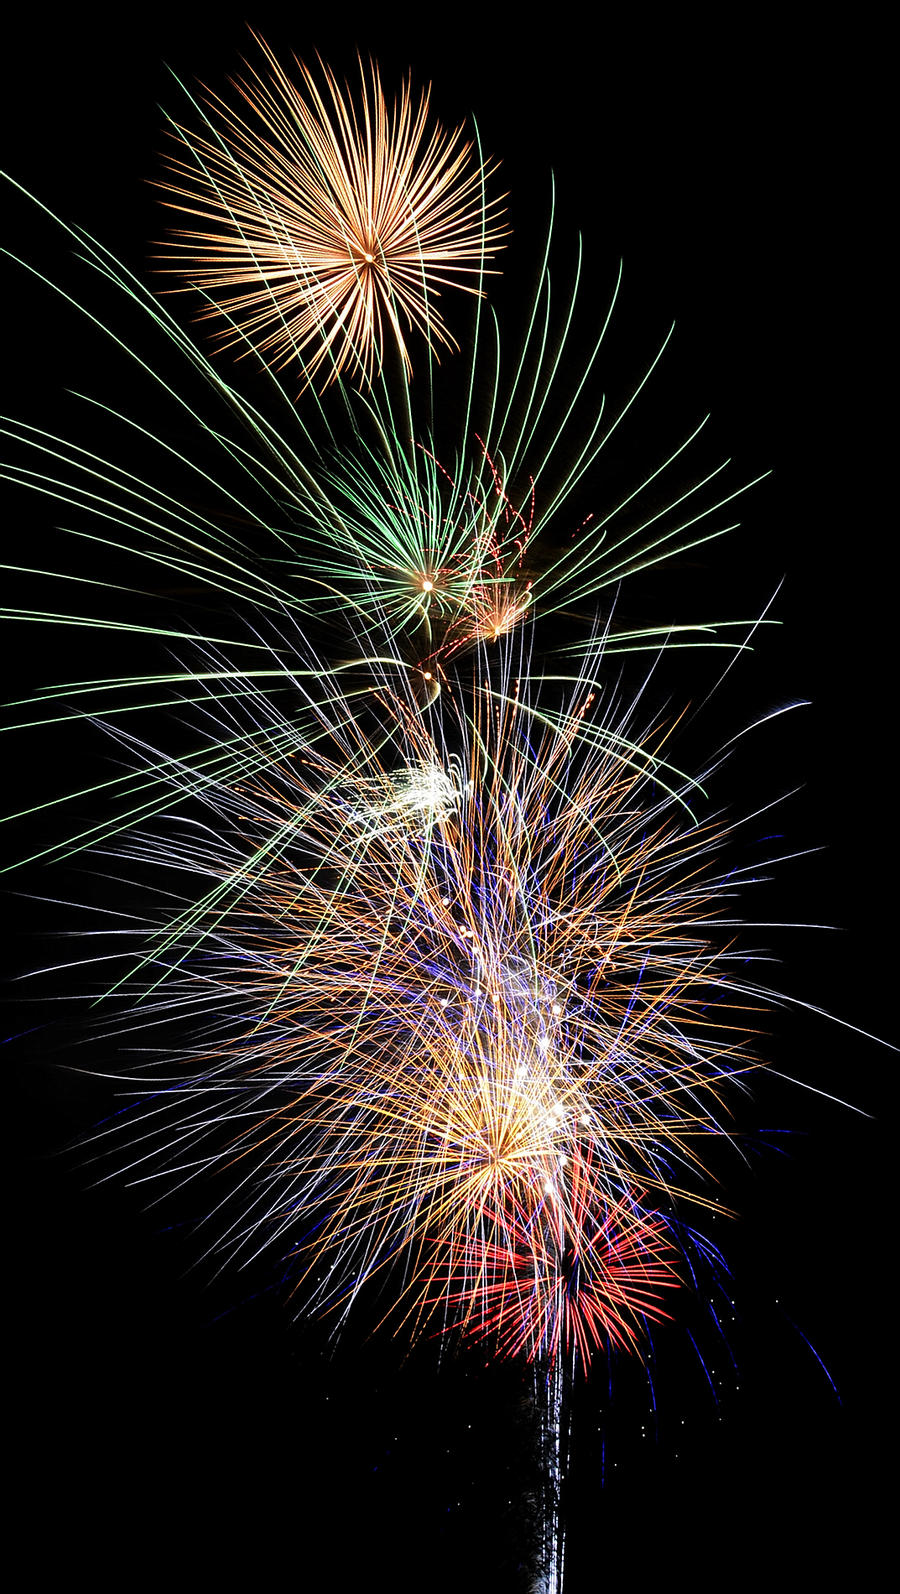 Firework by marschall196